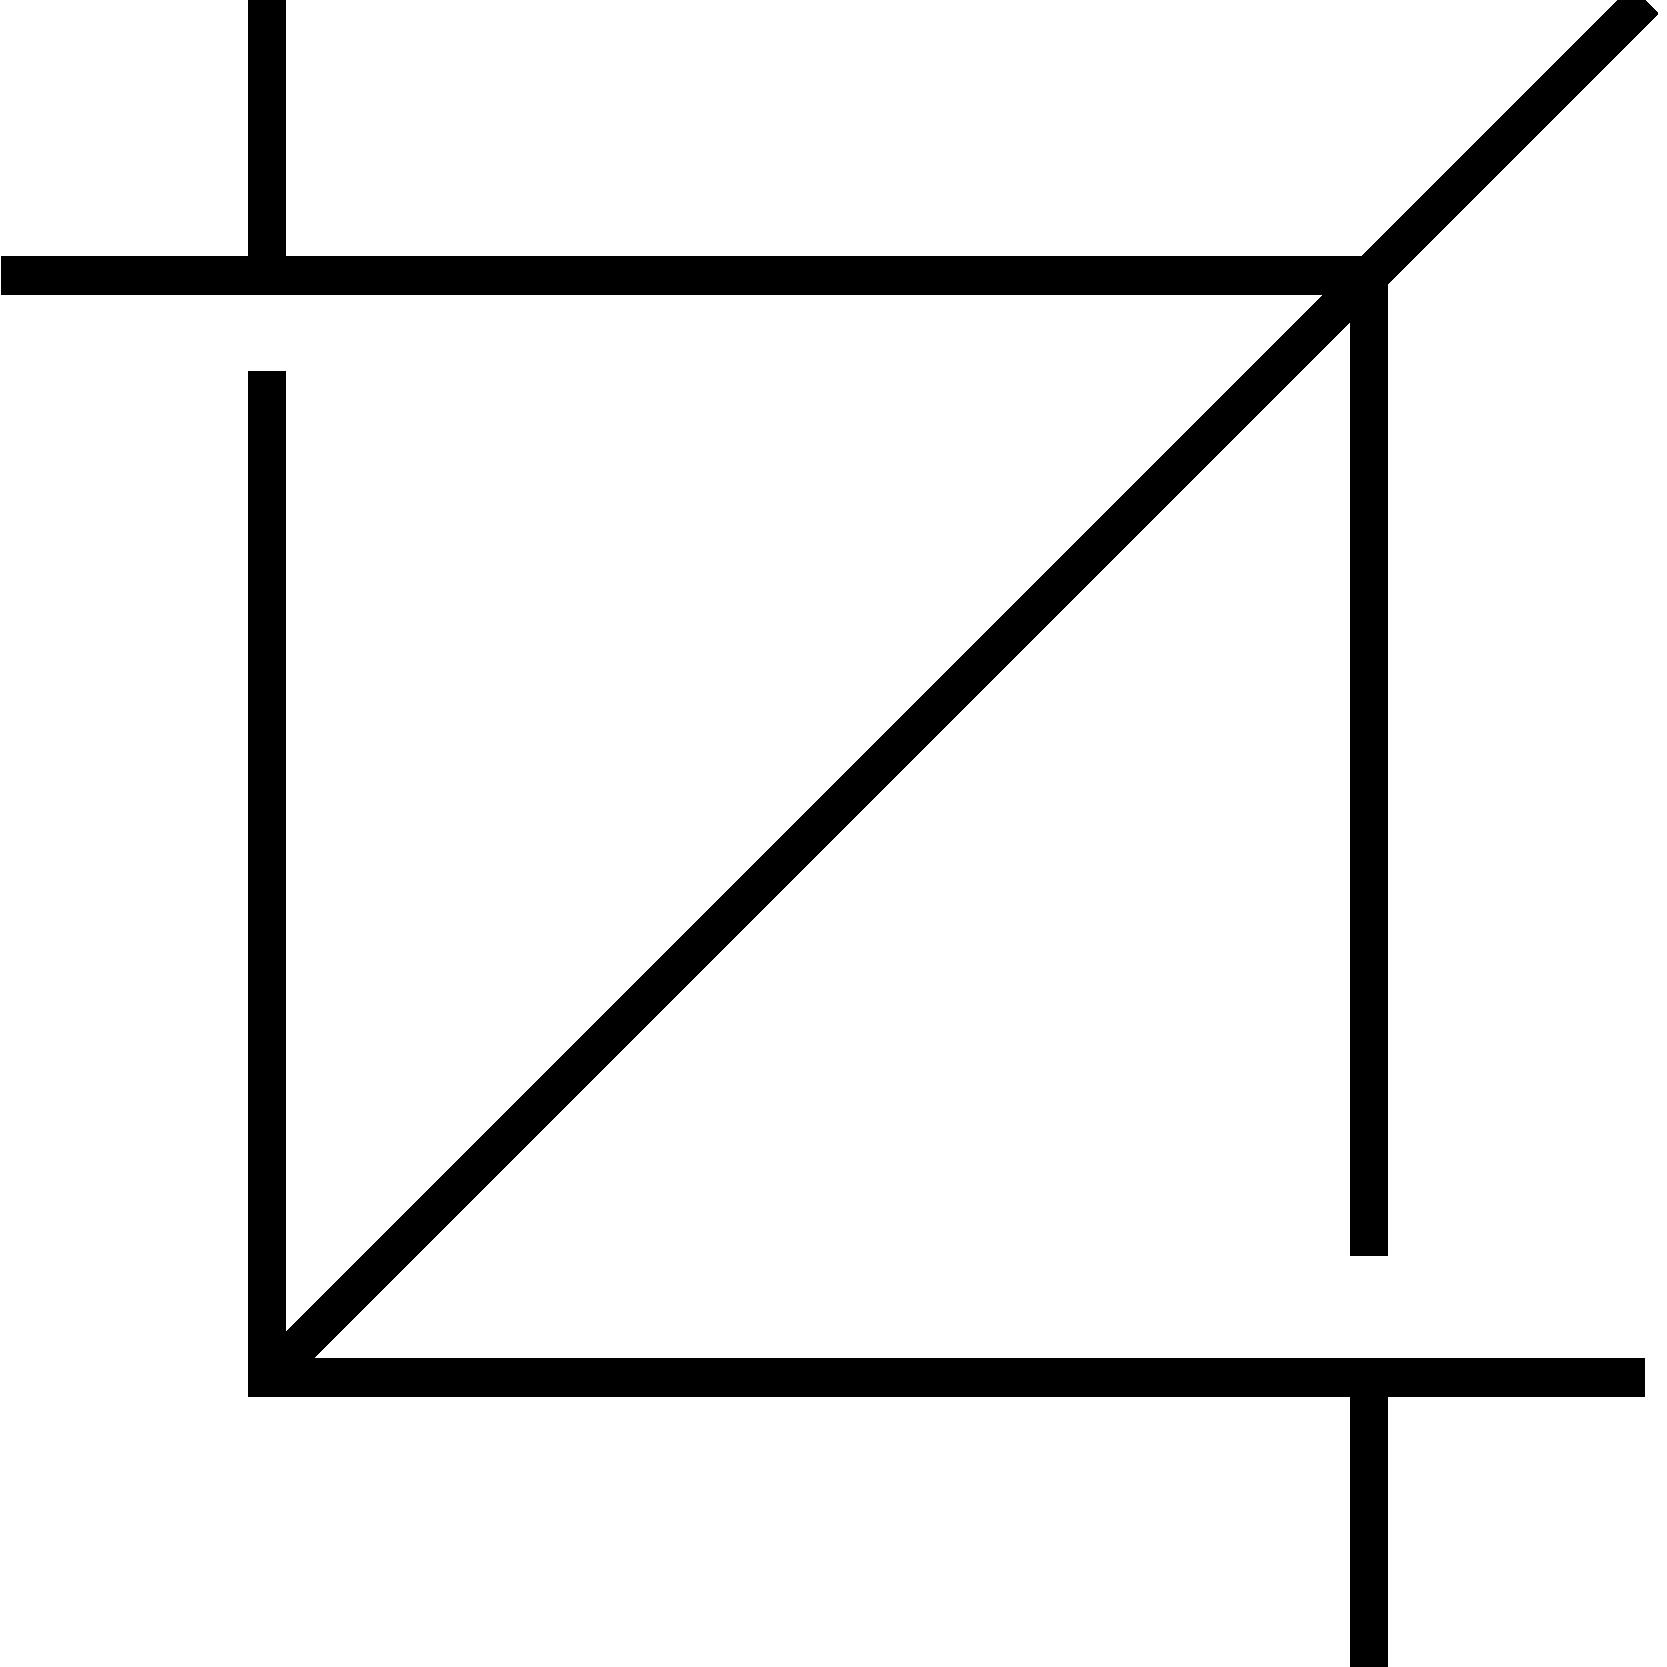 BID-principle-icons-01.png